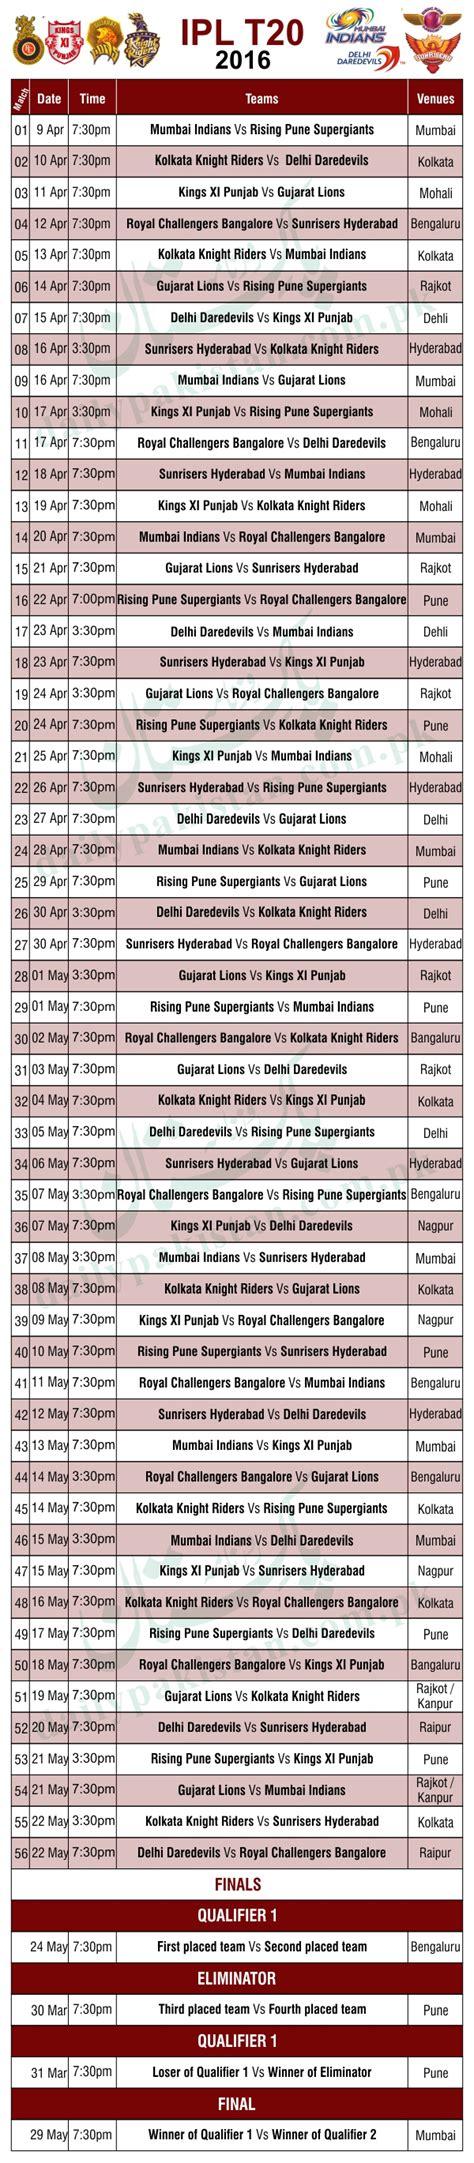 pepsi ipl 7 full match list download auto design tech ipl schedule for 2016 image calendar template 2016